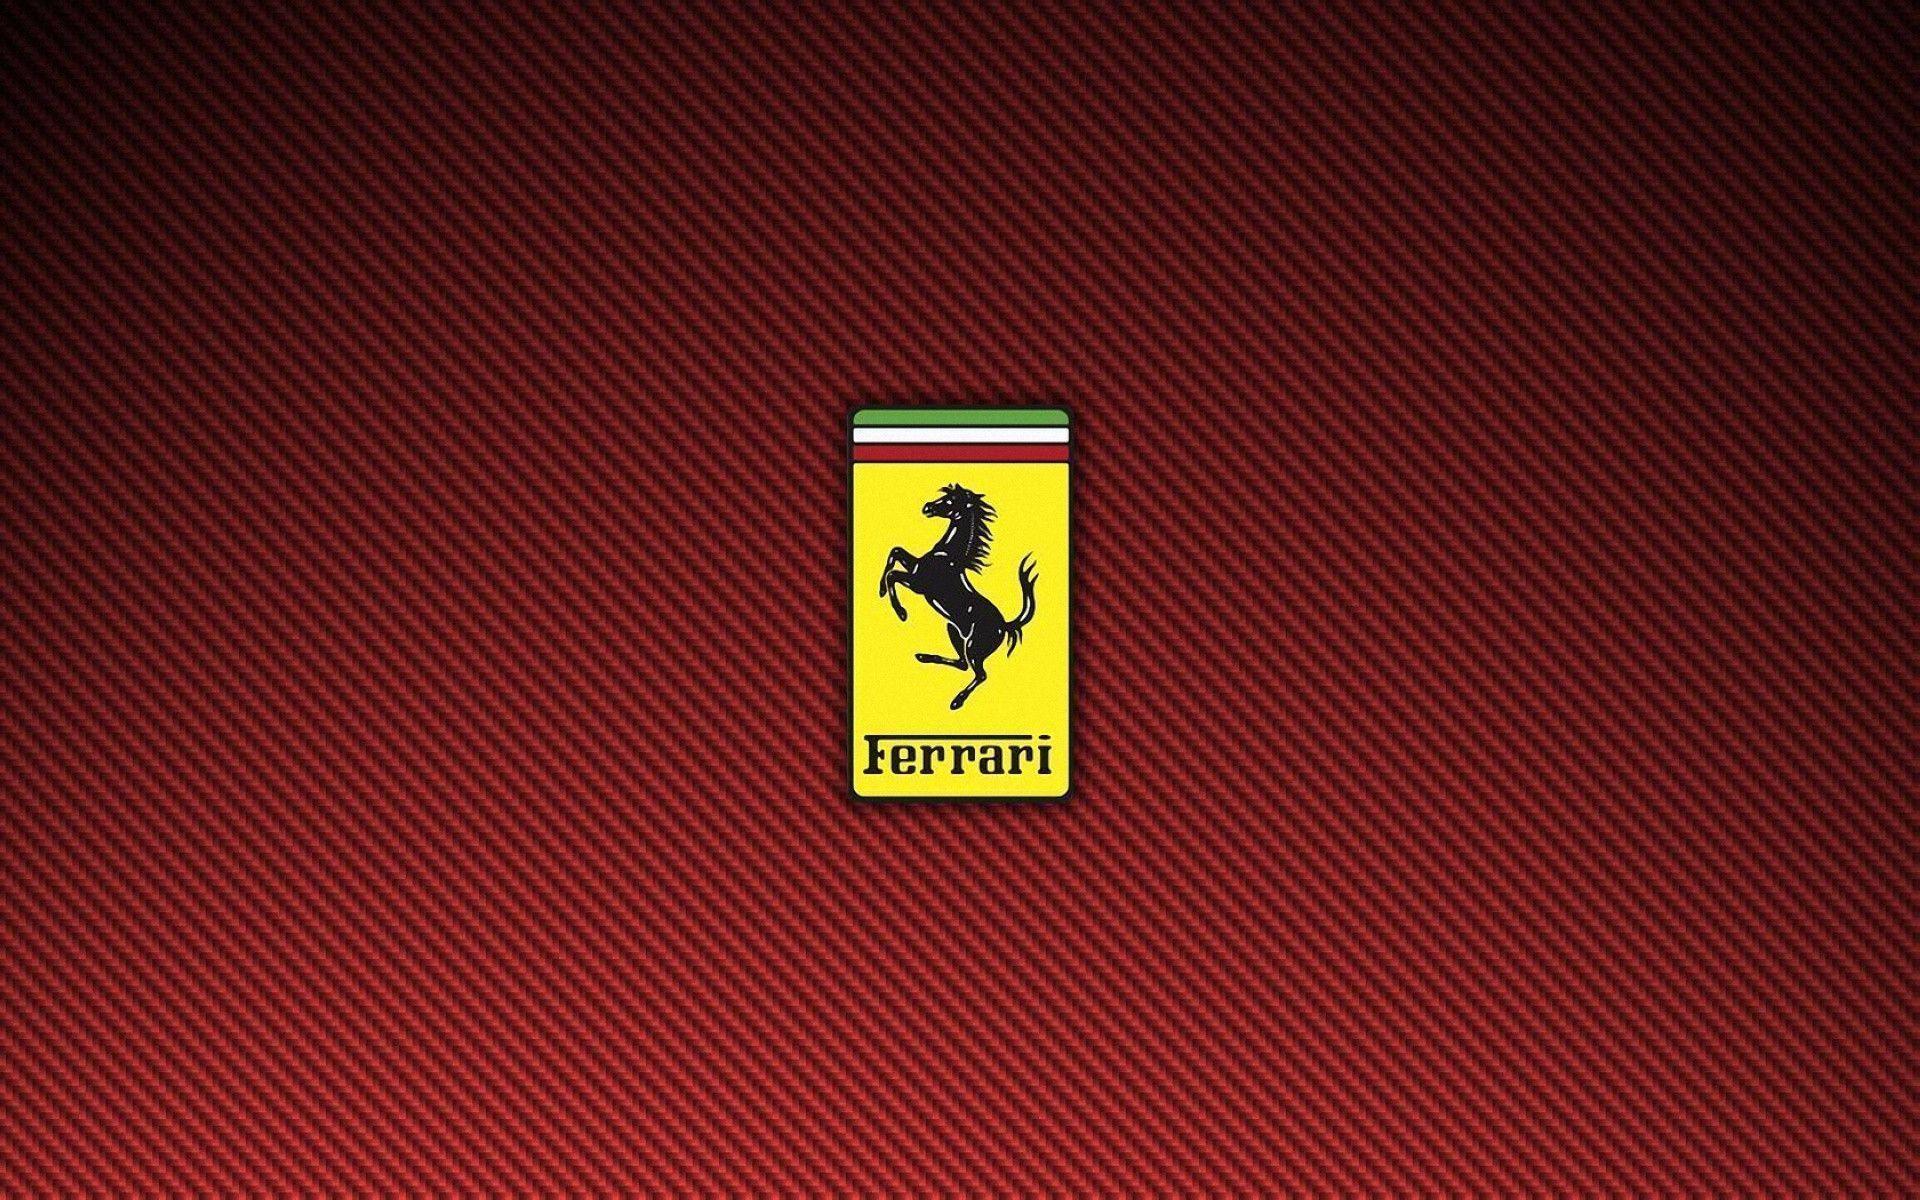 wallpapers ferrari logo - photo #22